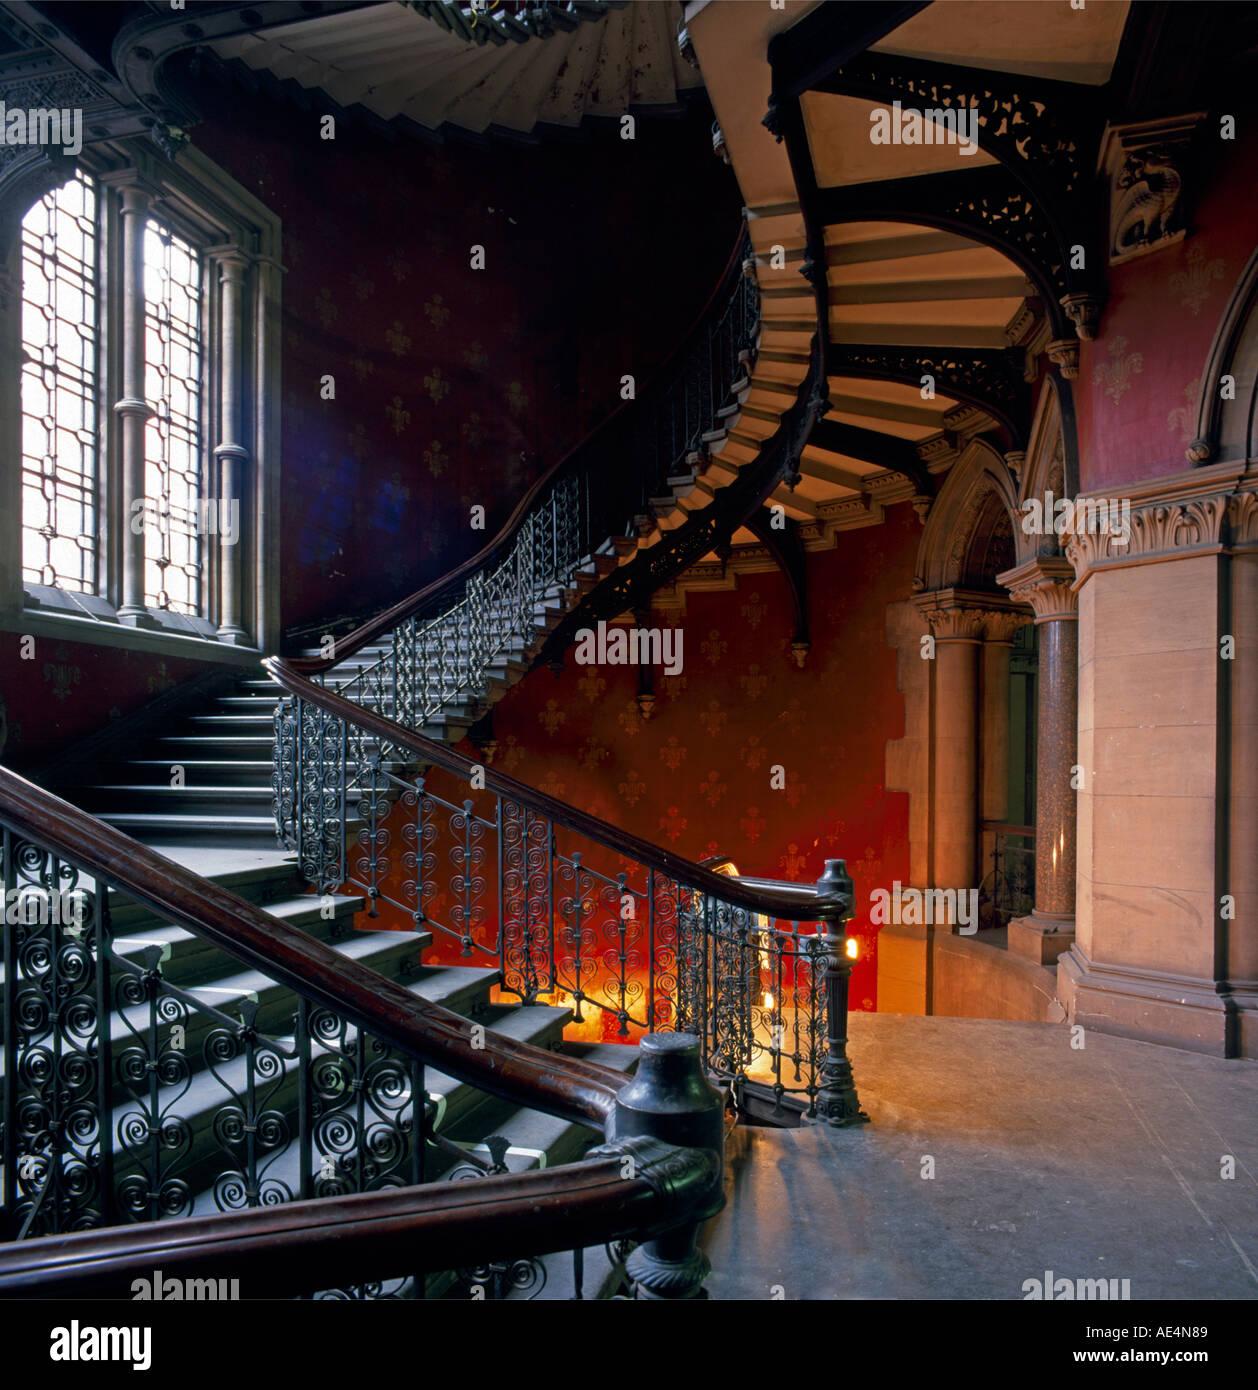 Grand Victorian scala gotica all'interno di St Pancras Camere London NW1 Inghilterra Foto Stock